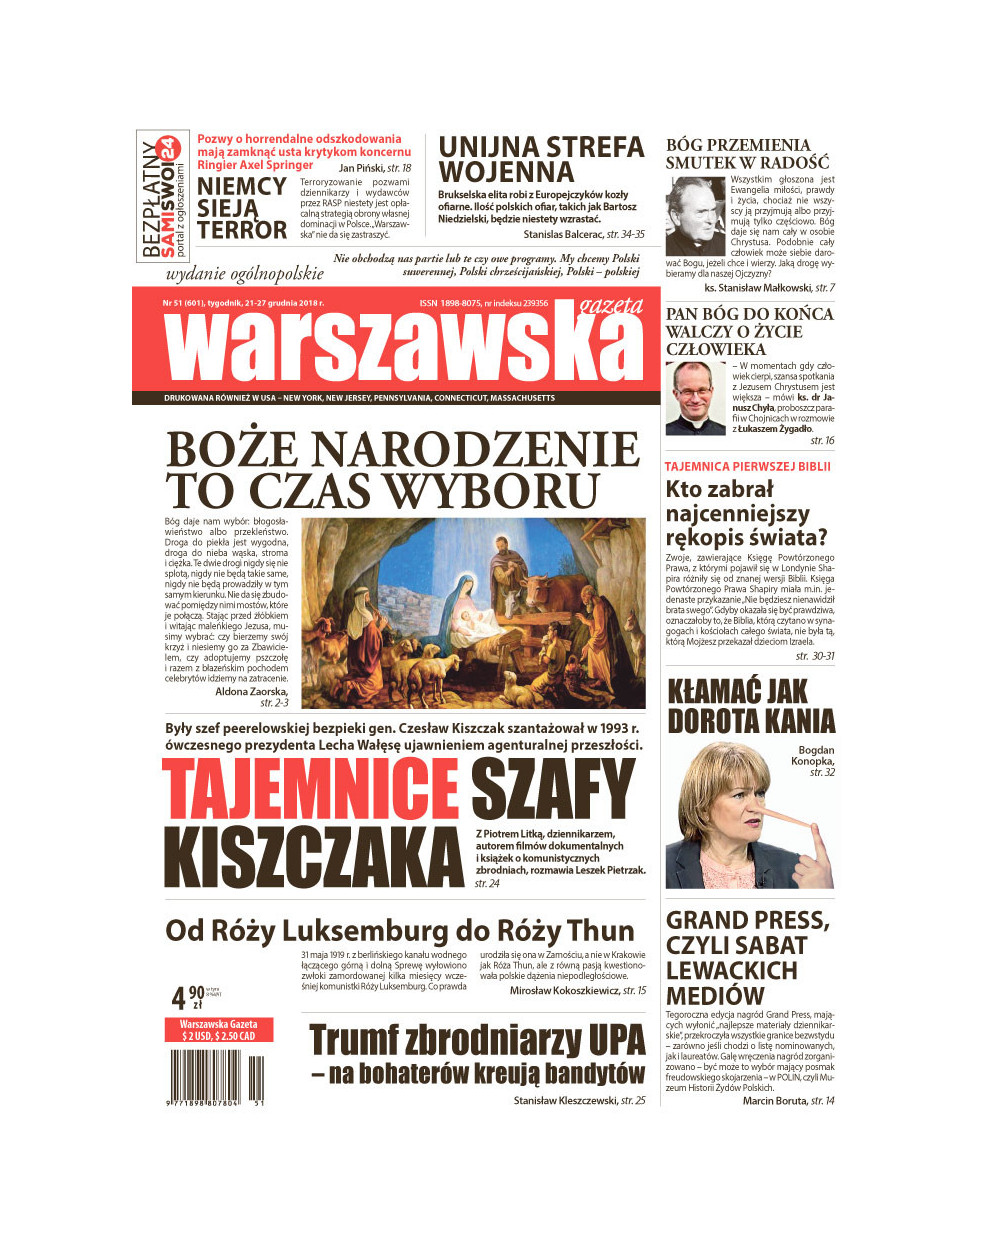 Warszawska Gazeta 51/2018